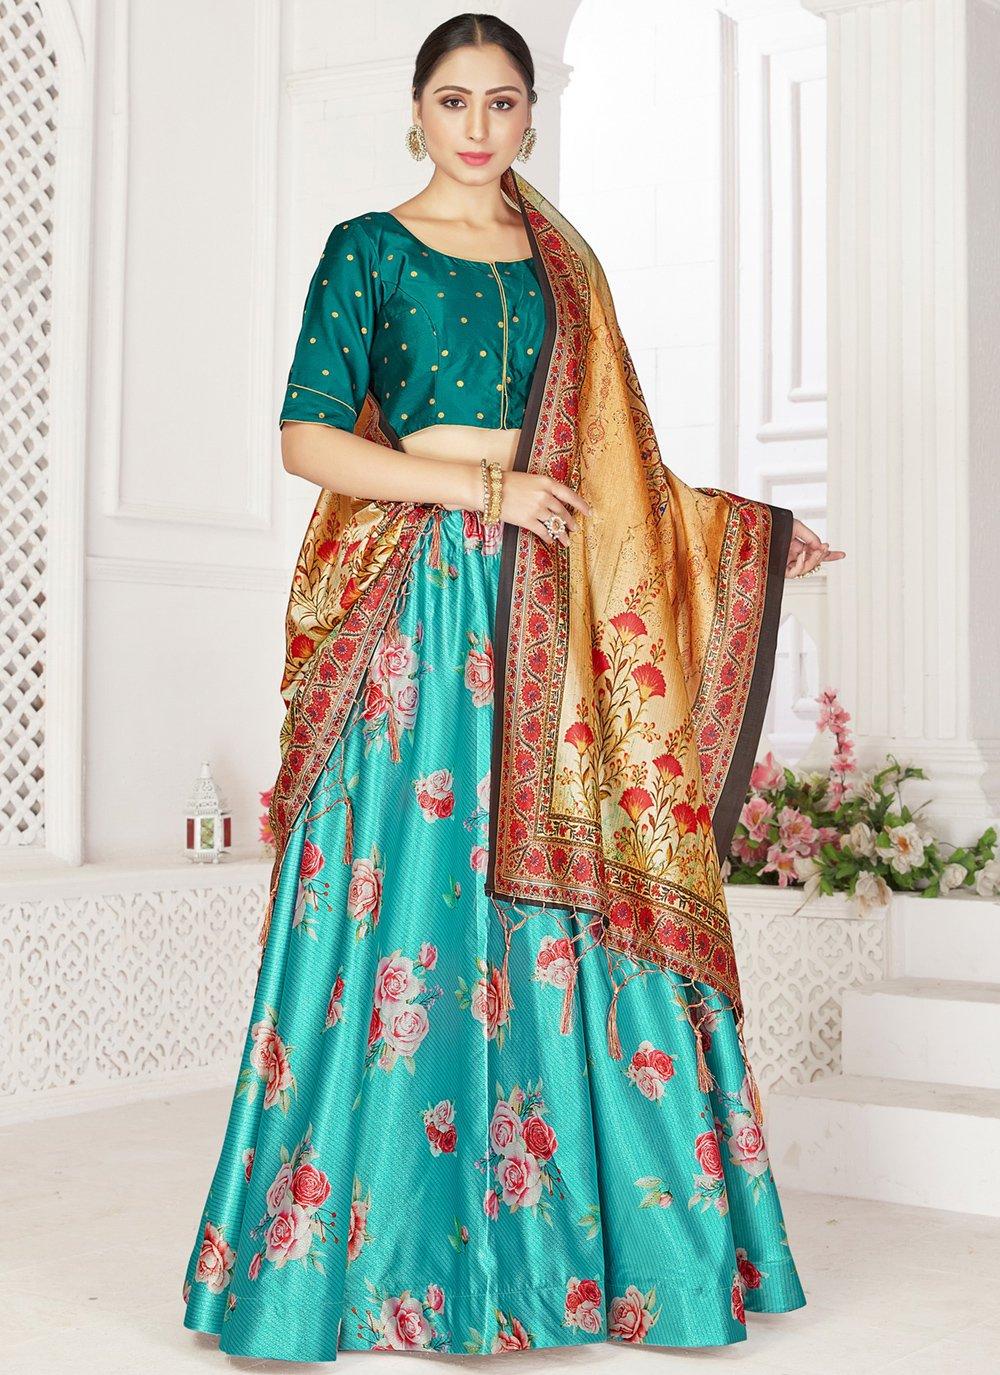 Digital Print Satin Readymade Lehenga Choli in Turquoise